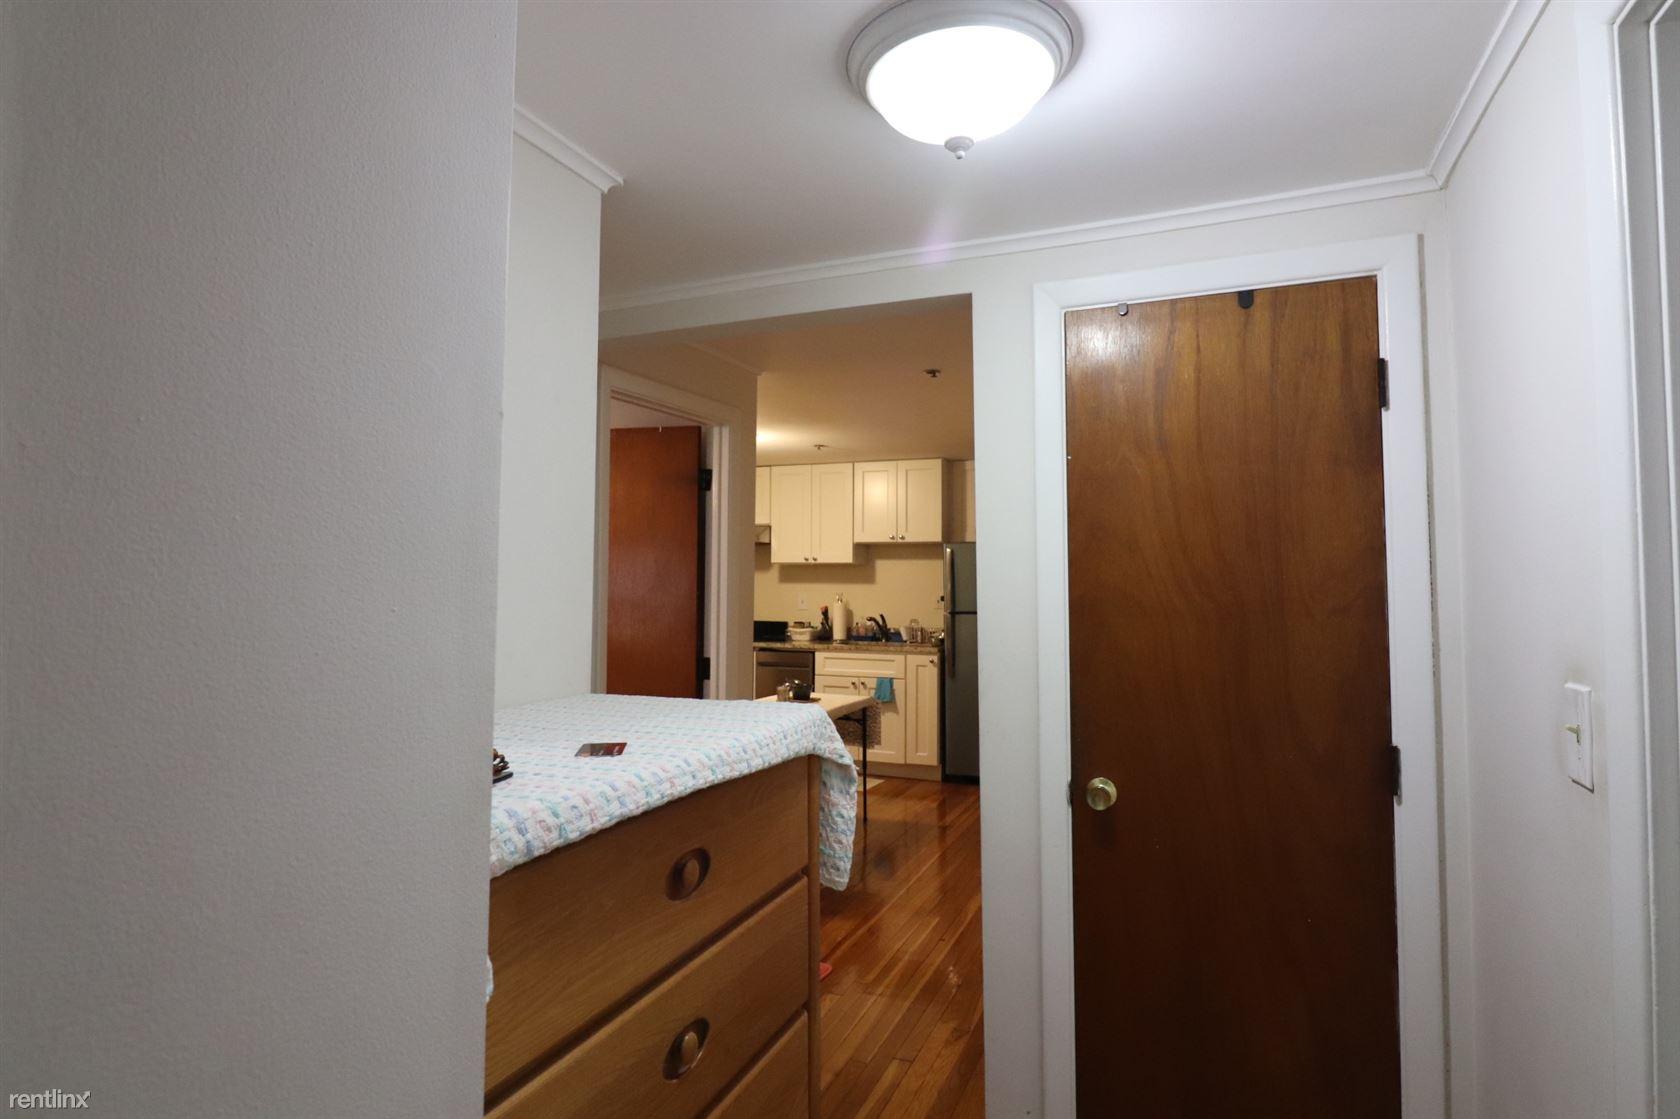 1477 Beacon St. 101, Brookline, MA - $2,125